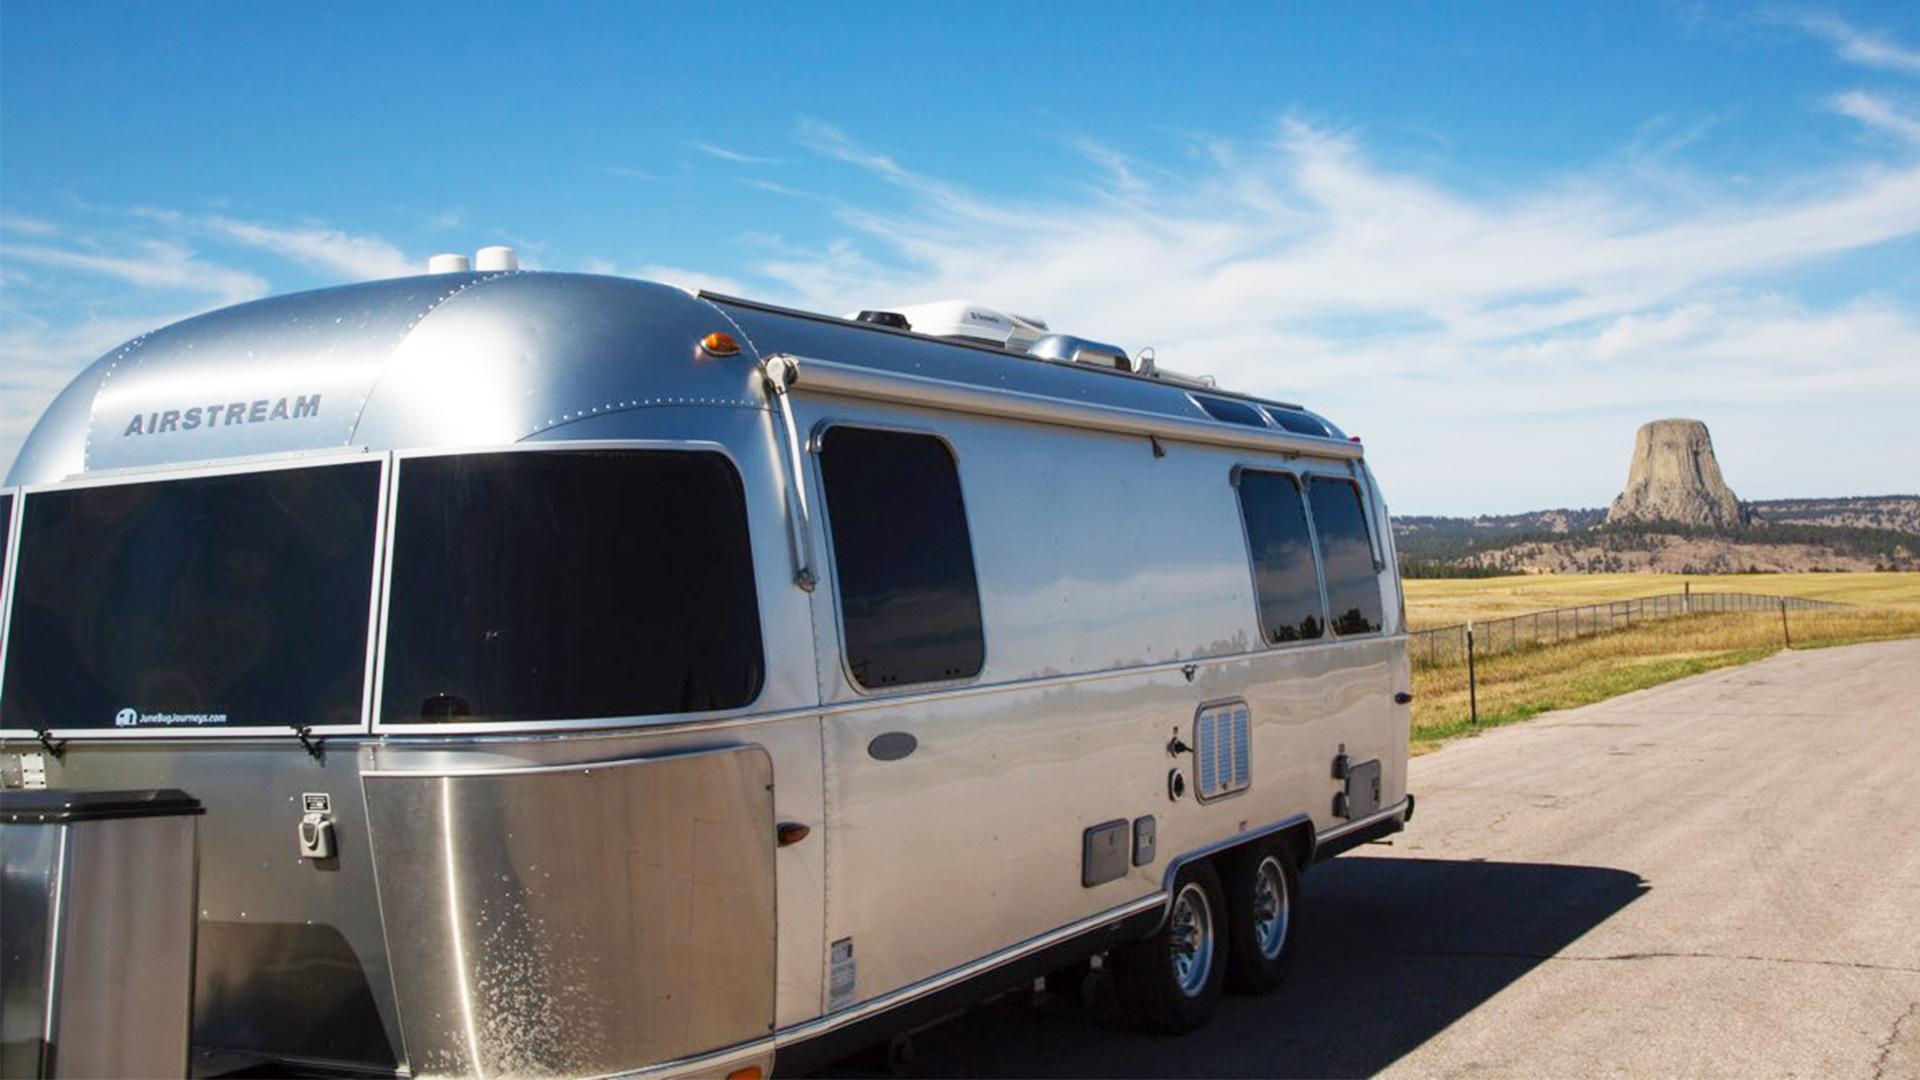 One Couple's Airstream Interstate Adventures - Airstream of